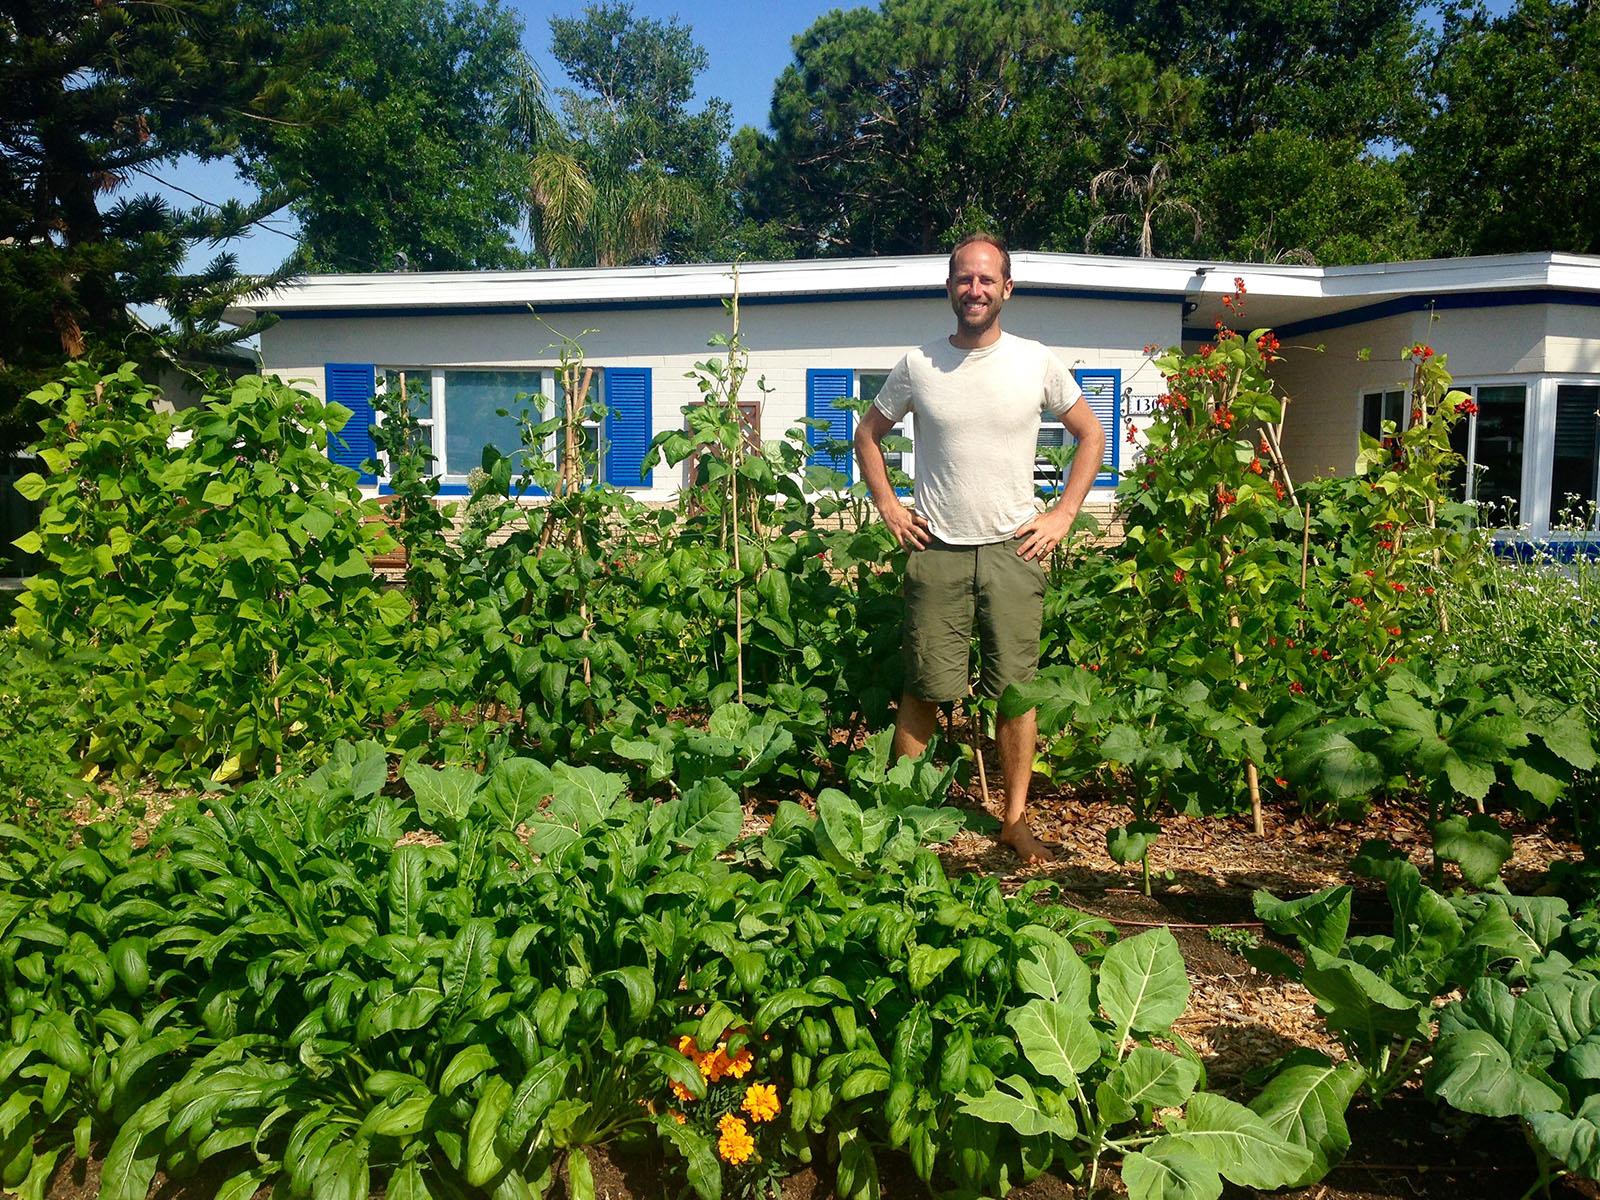 Rob's Front Yard Garden